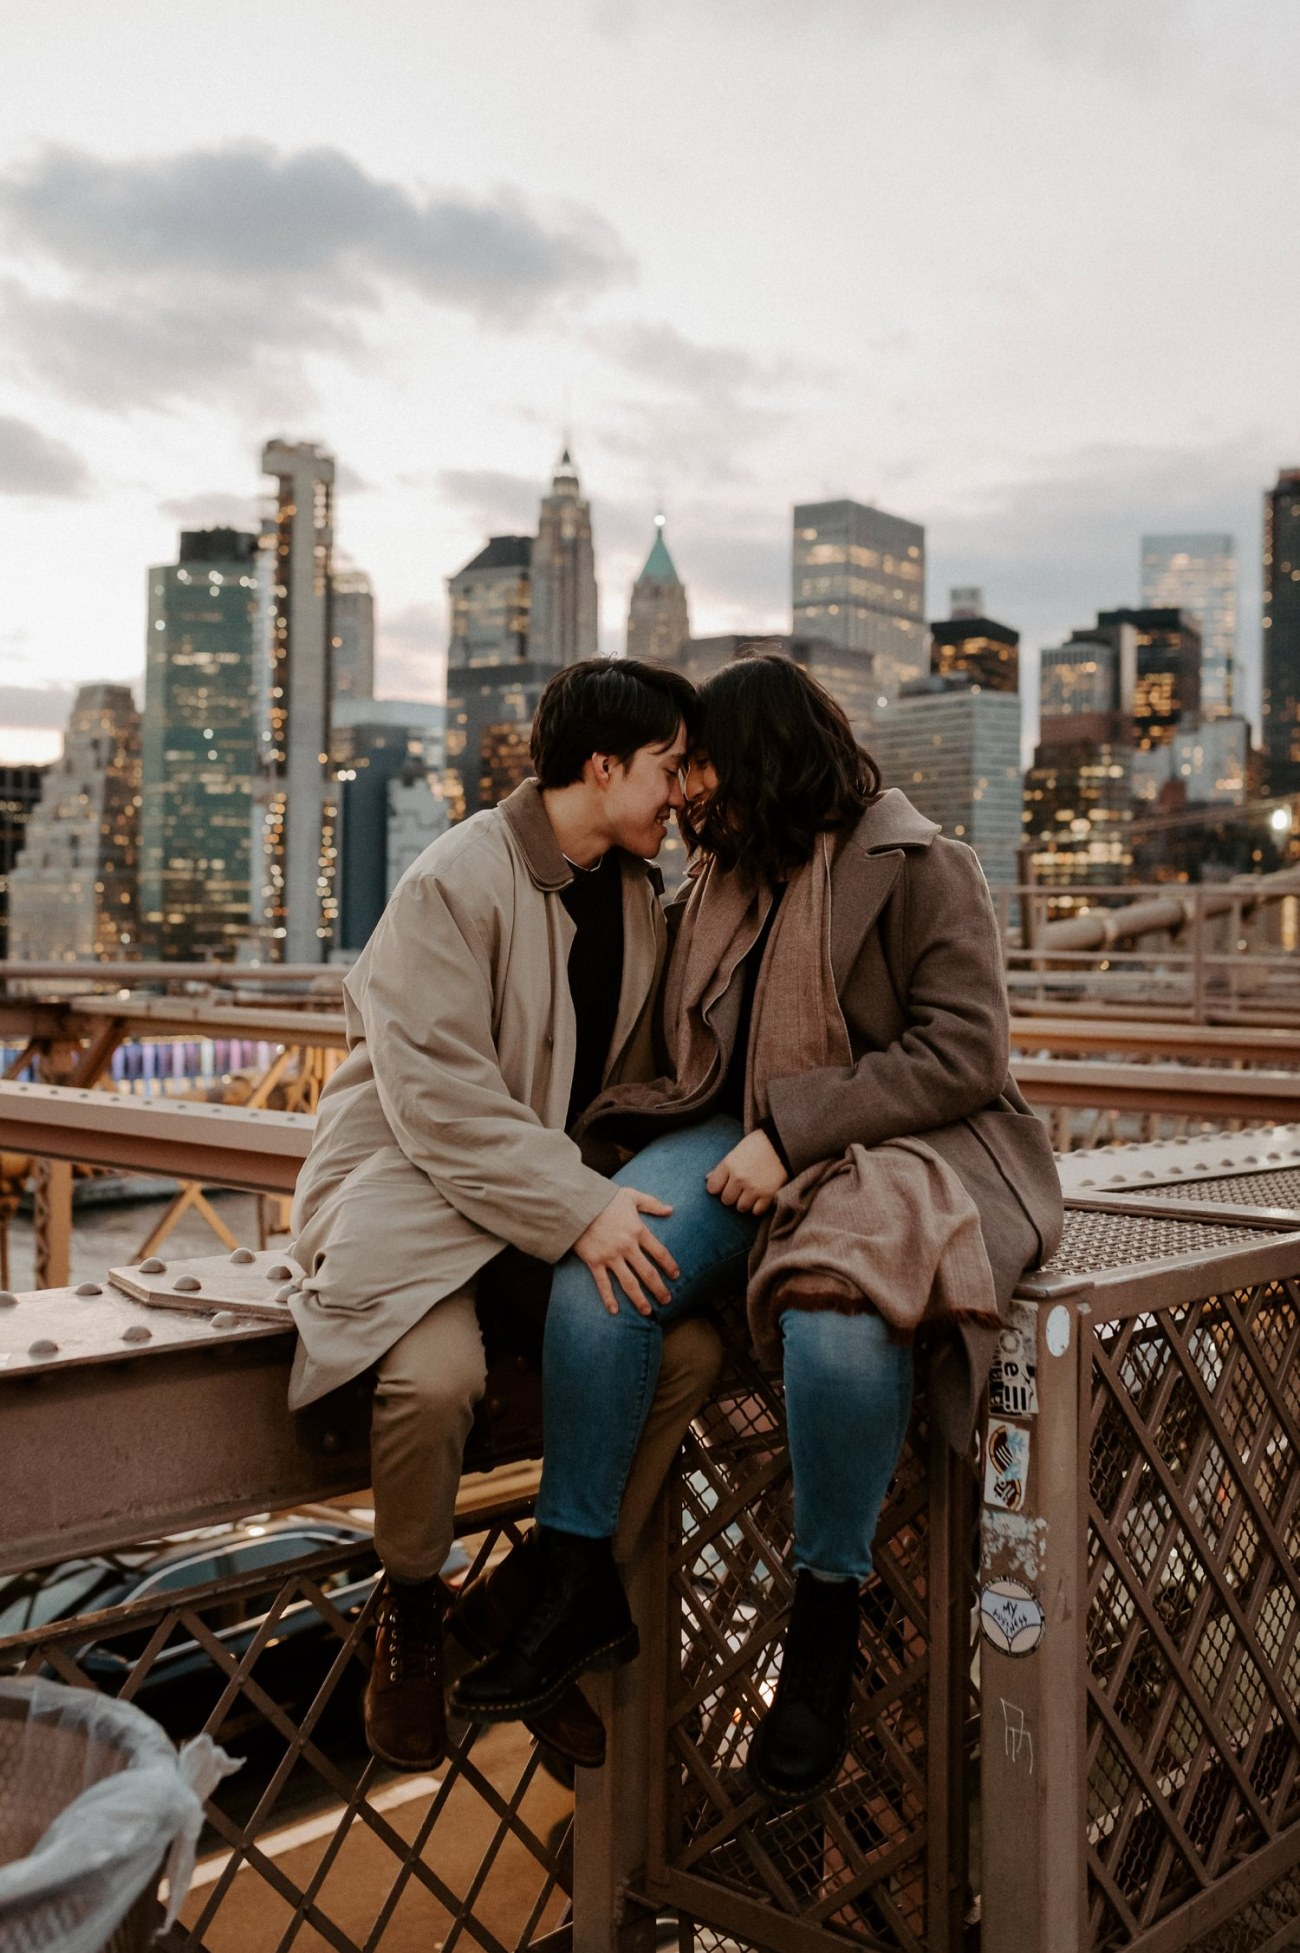 Brooklyn Bridge Sunset Couple Session New York Wedding Photographer NYC Best Engagement Photos Location Anais Possamai Photography 16